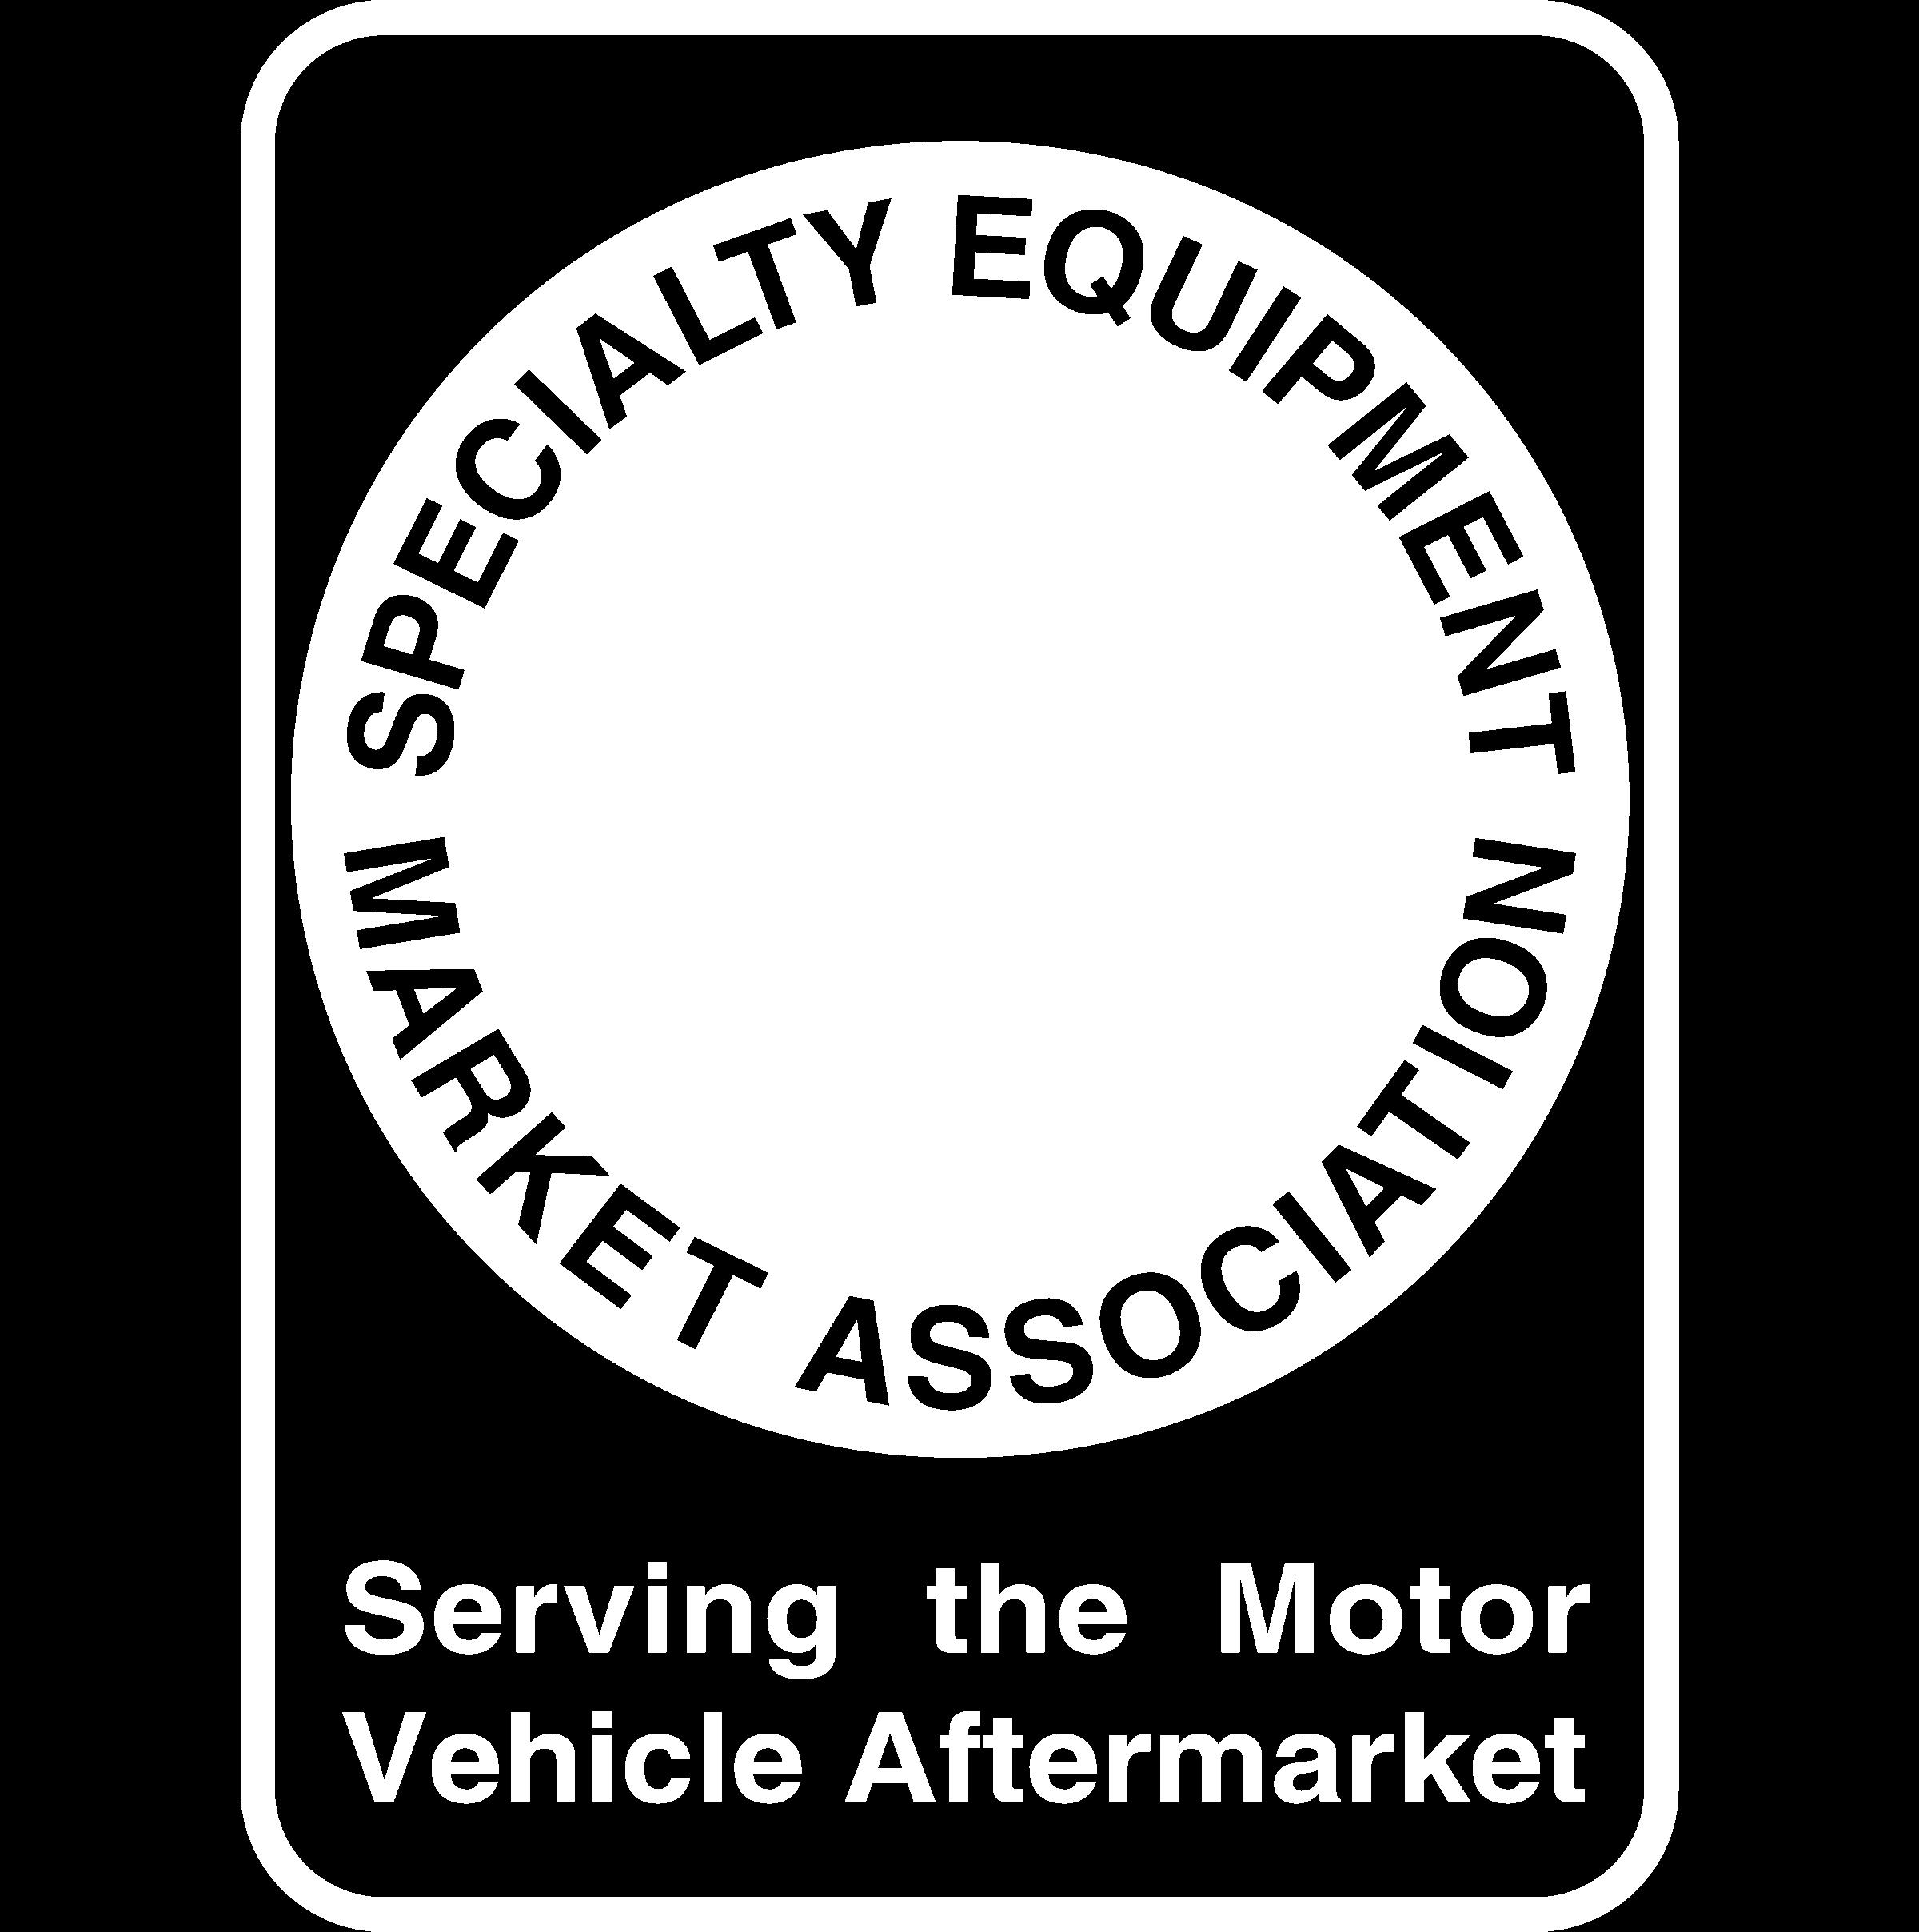 SEMA Association Logo PNG Transparent & SVG Vector.